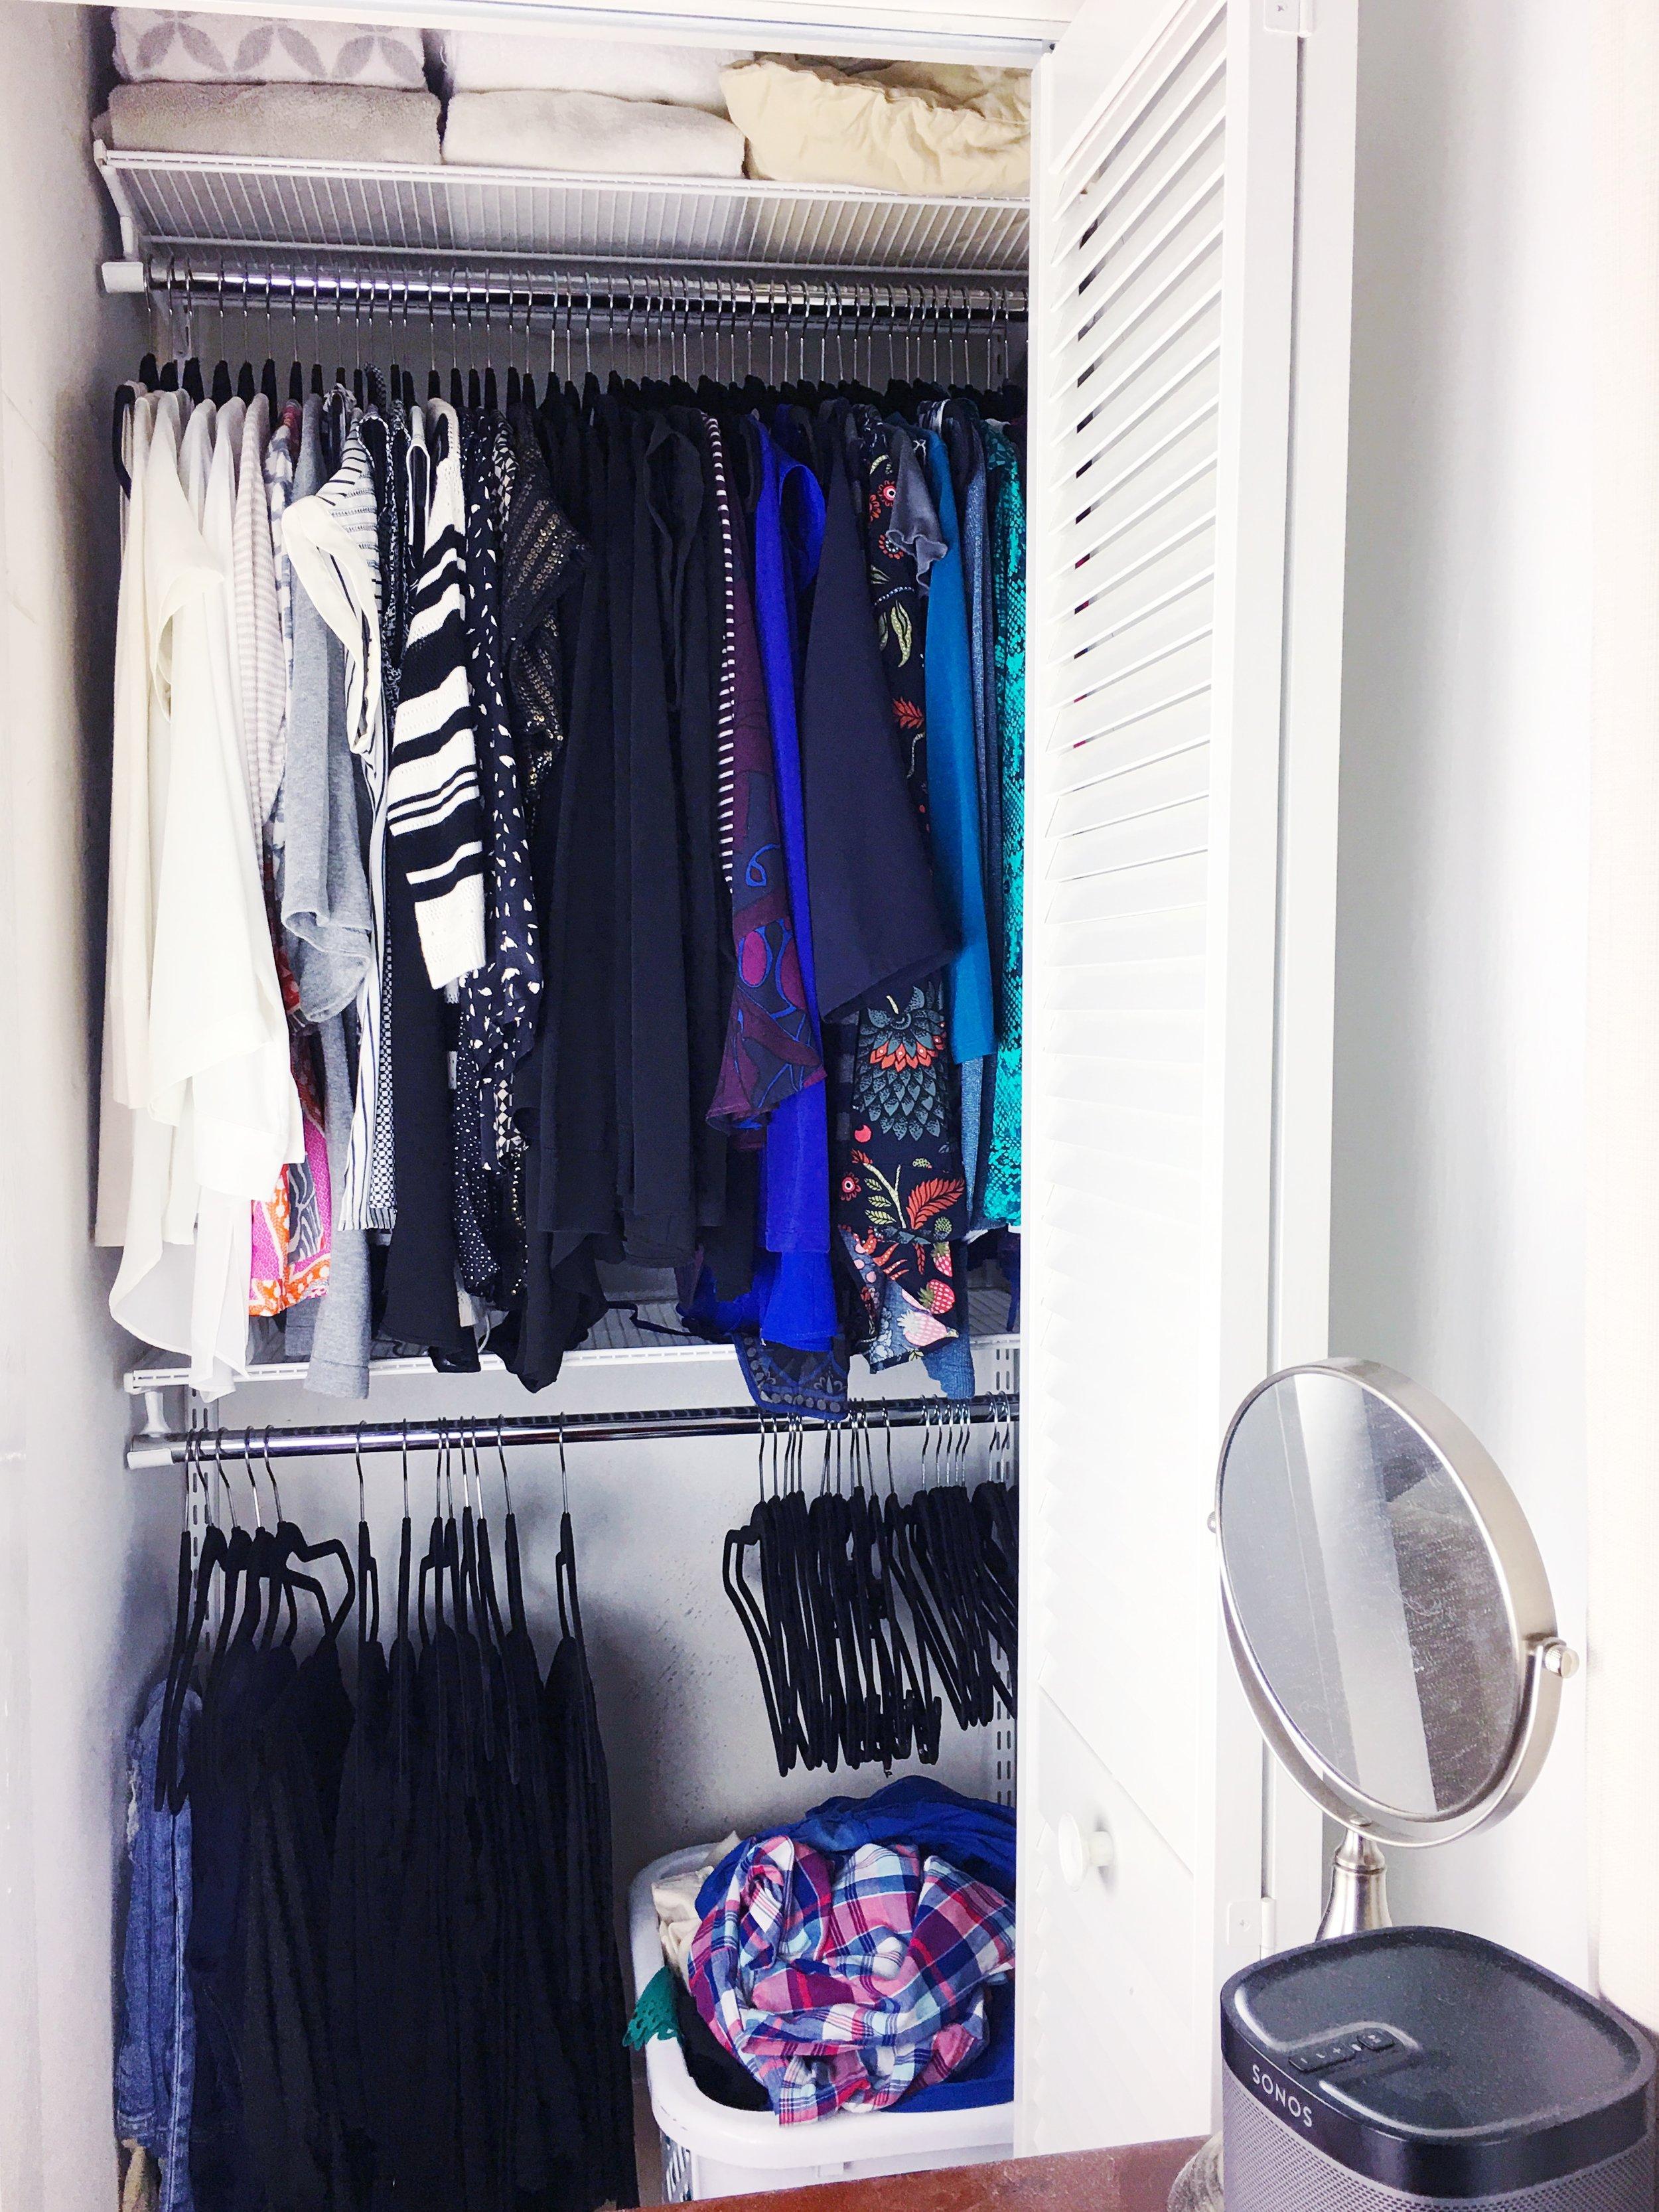 'hers' closet organization after